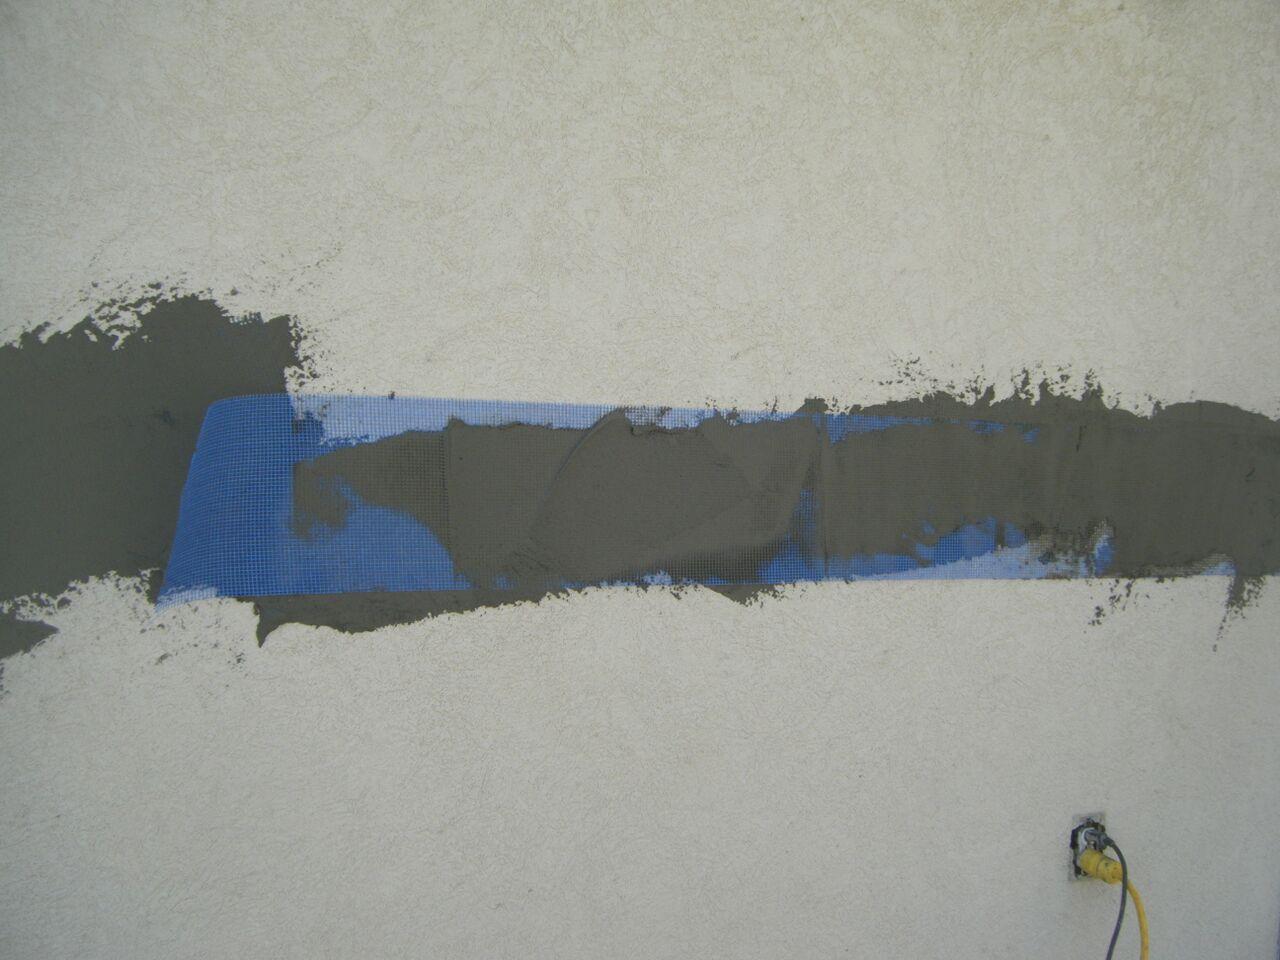 stucco-cracks-ram-2